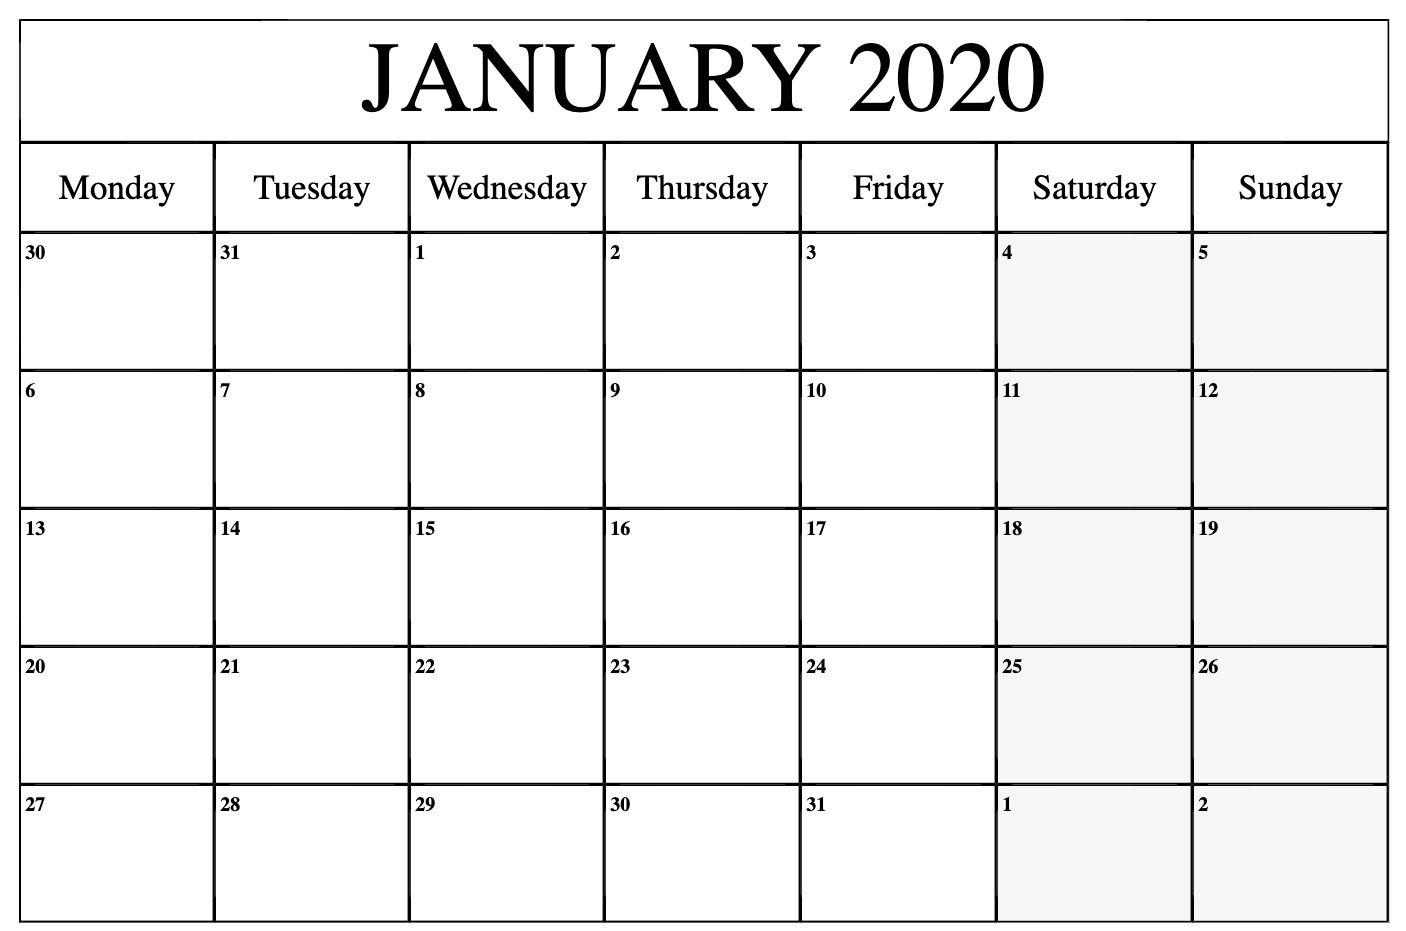 January 2020 Calendar Printable Monday | Printable Calendar